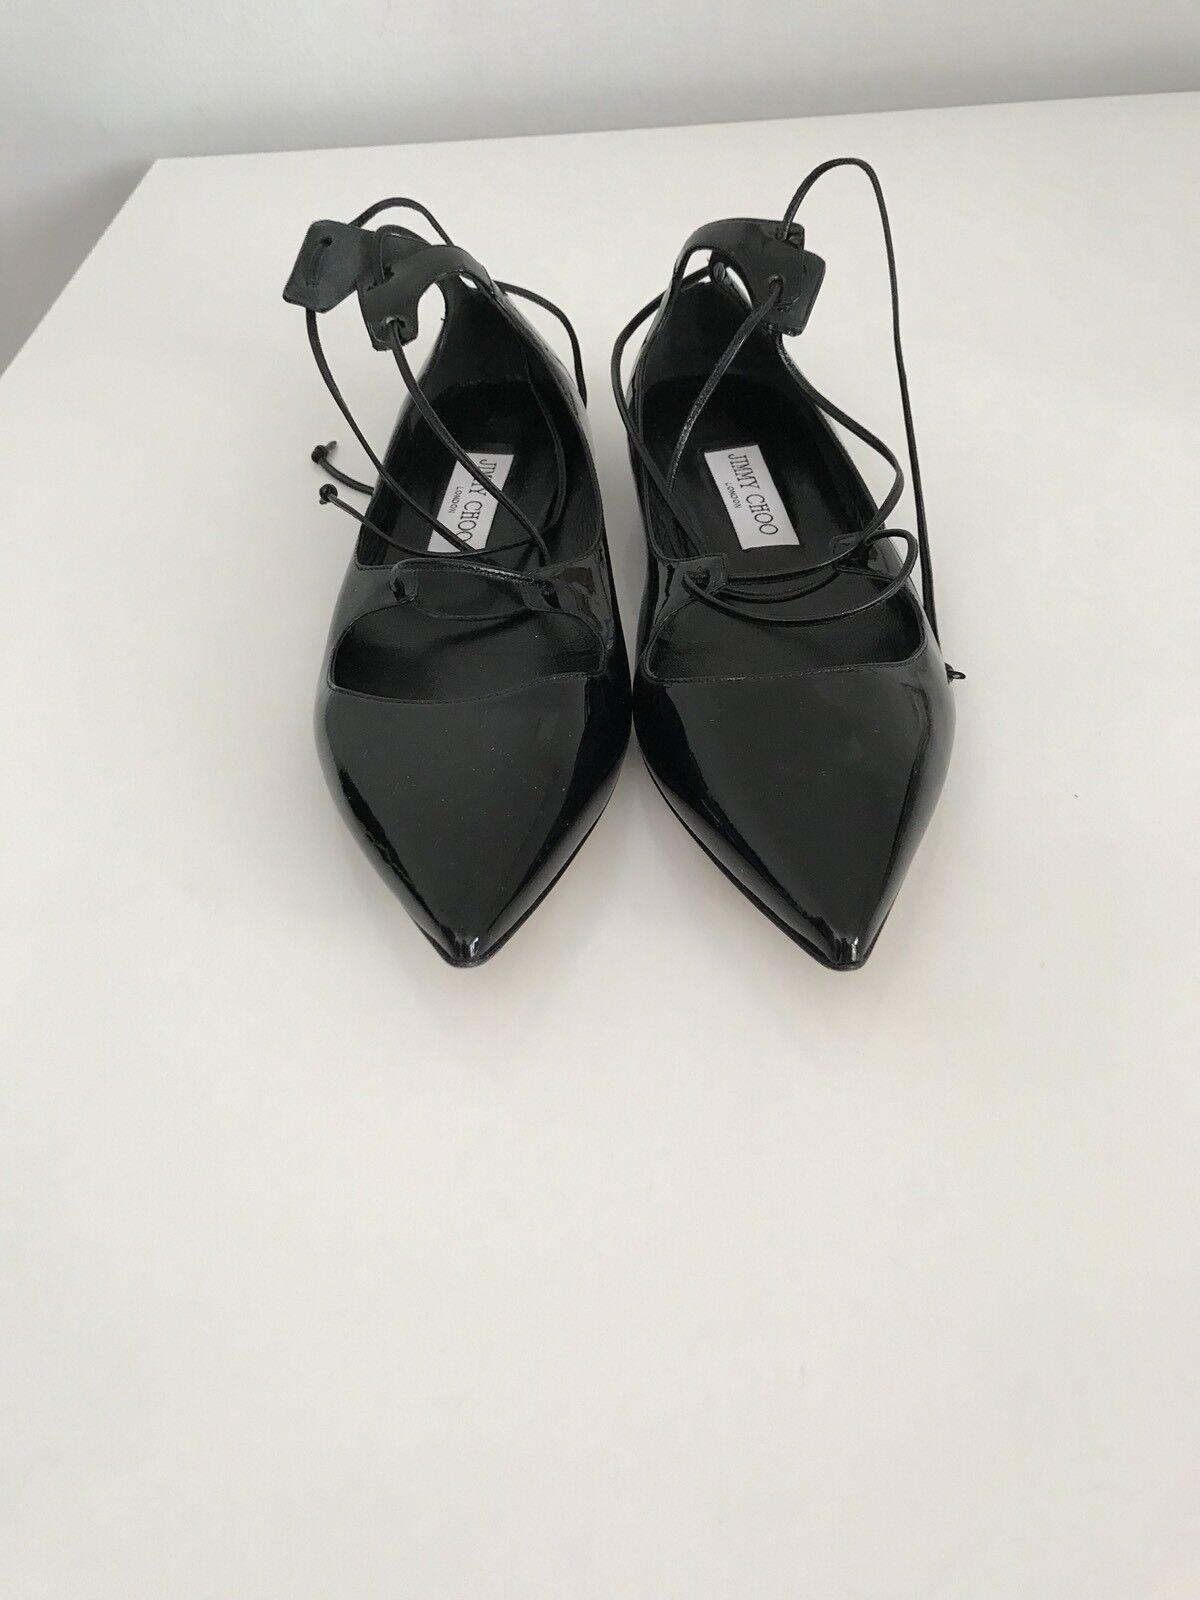 595 Jimmy Choo Cordones Londres Vita Con Cordones Choo Tacón Bajo Charol Negro Zapatos Talla 38 1 2 f4f072